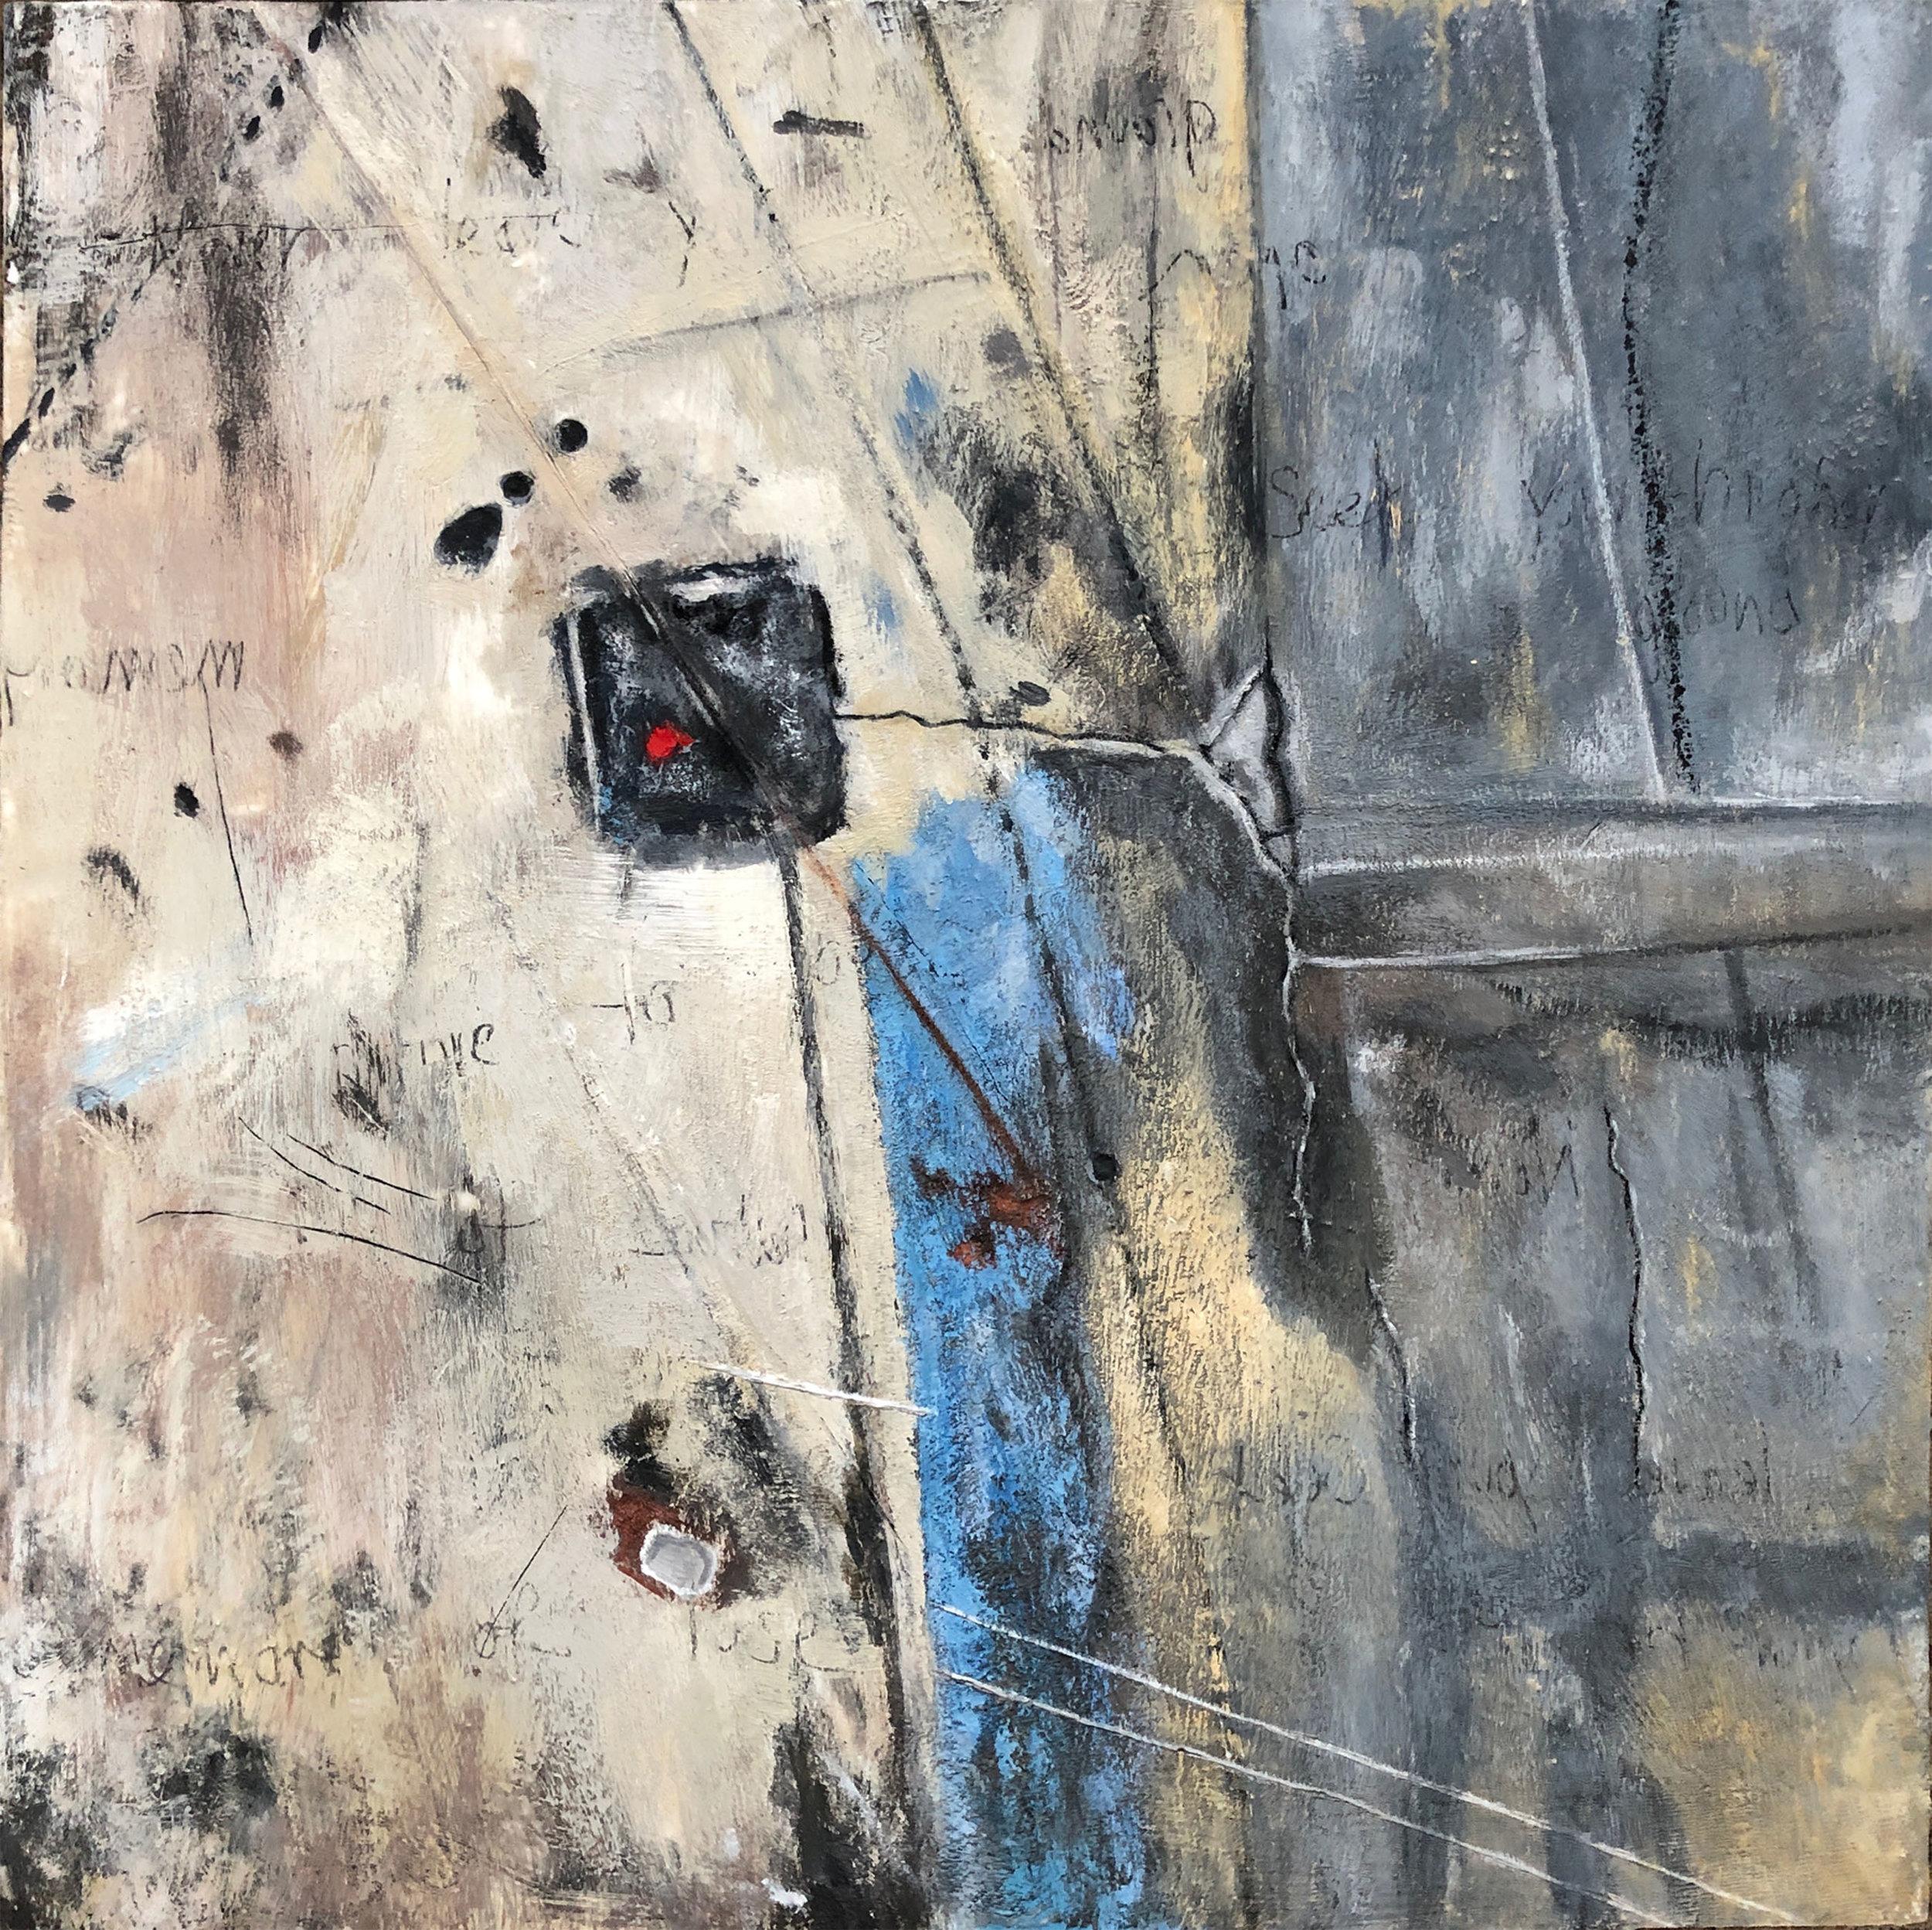 Tracy Spadafora,  Seek Higher Ground , Encaustic and oil on wood panel, 24x24